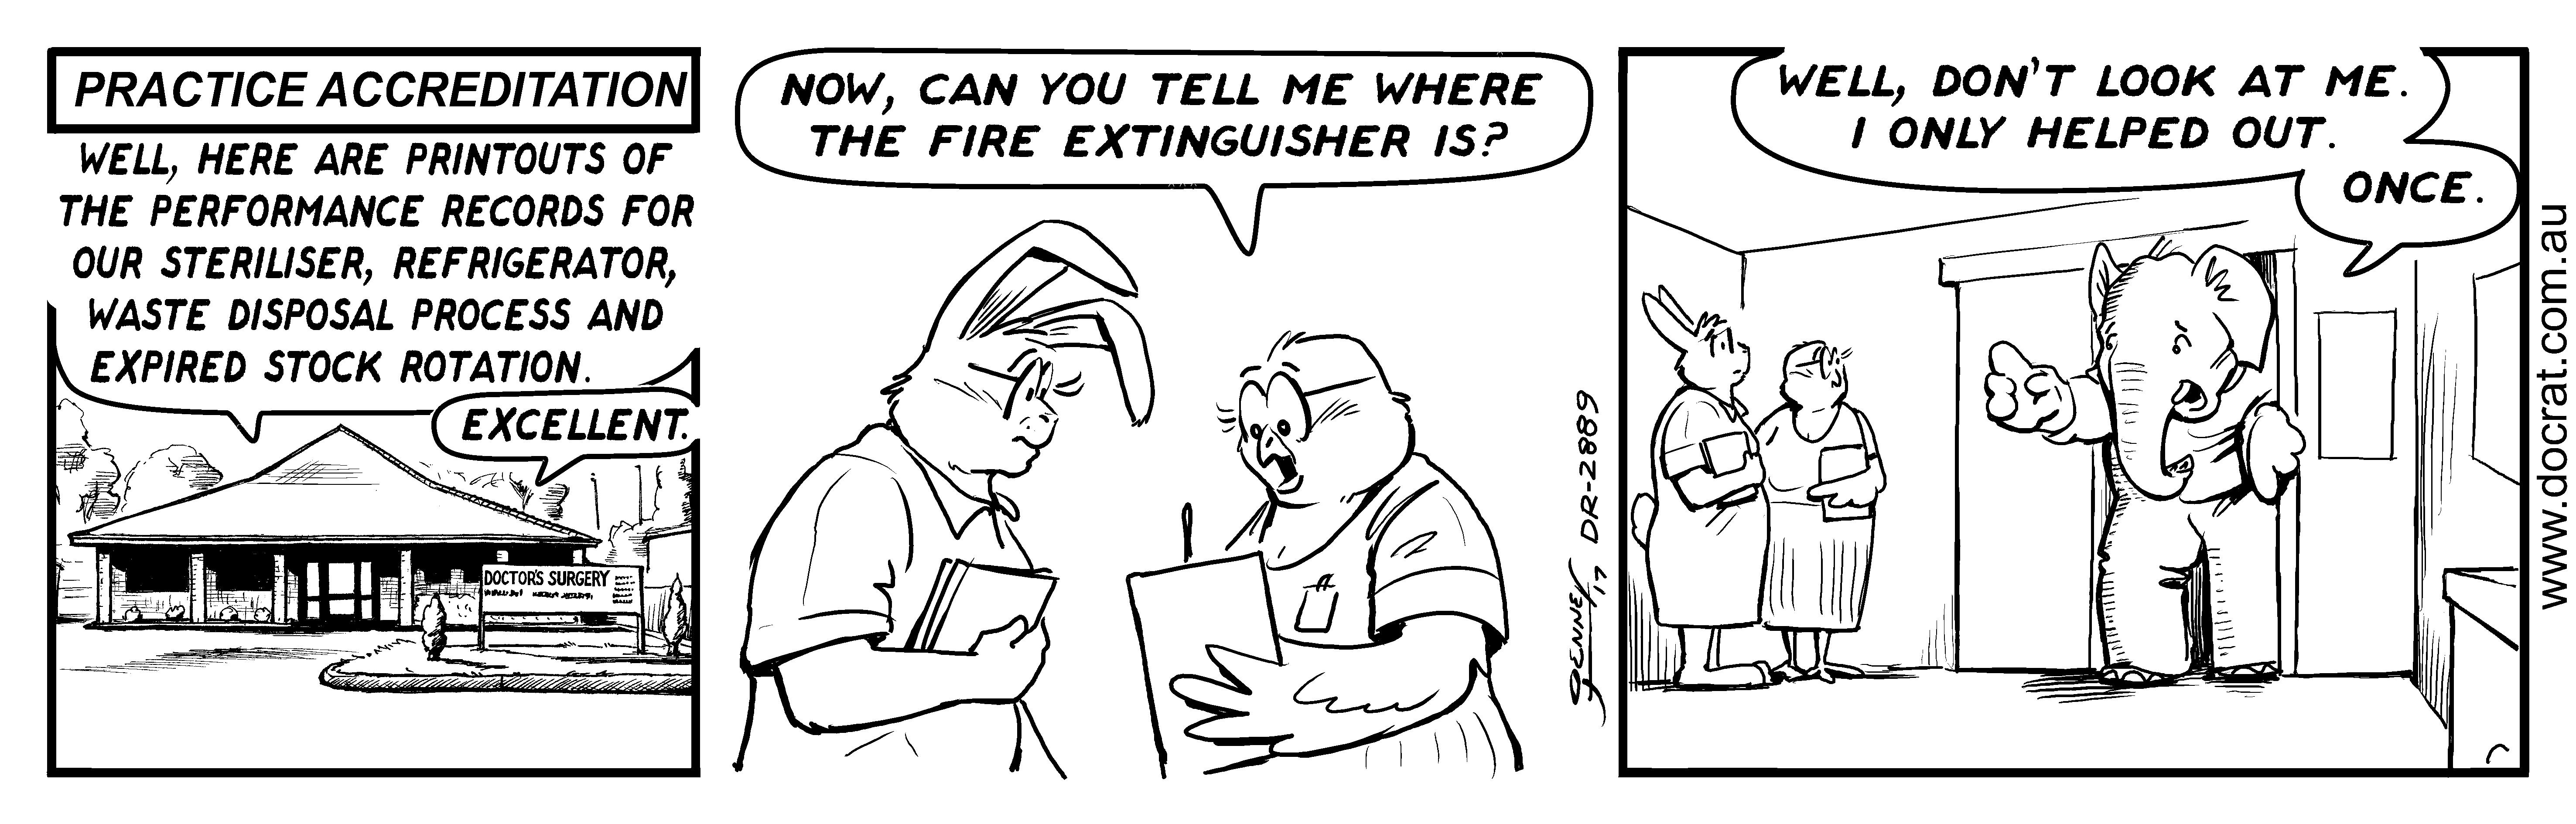 20171019